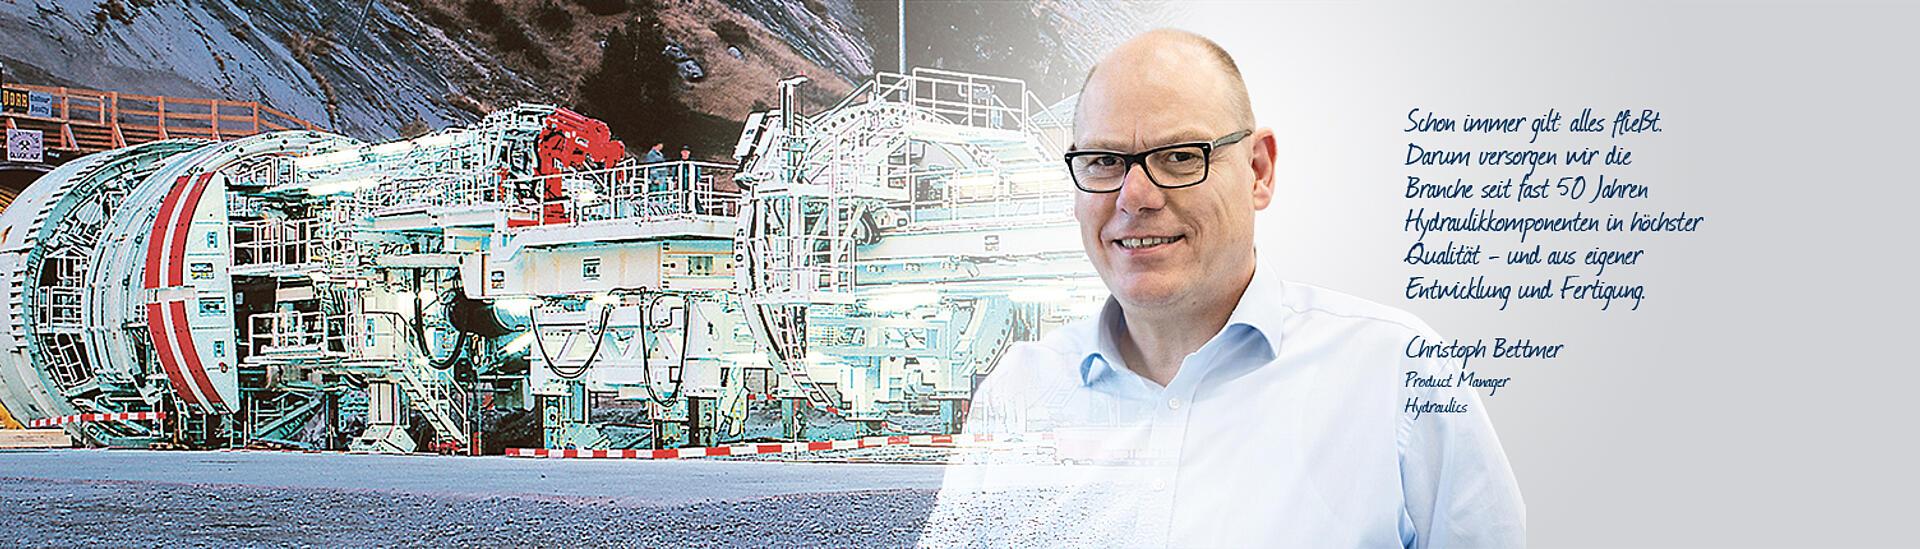 Ansprechpartner Hydraulik Komponenten - KTR Systems GmbH